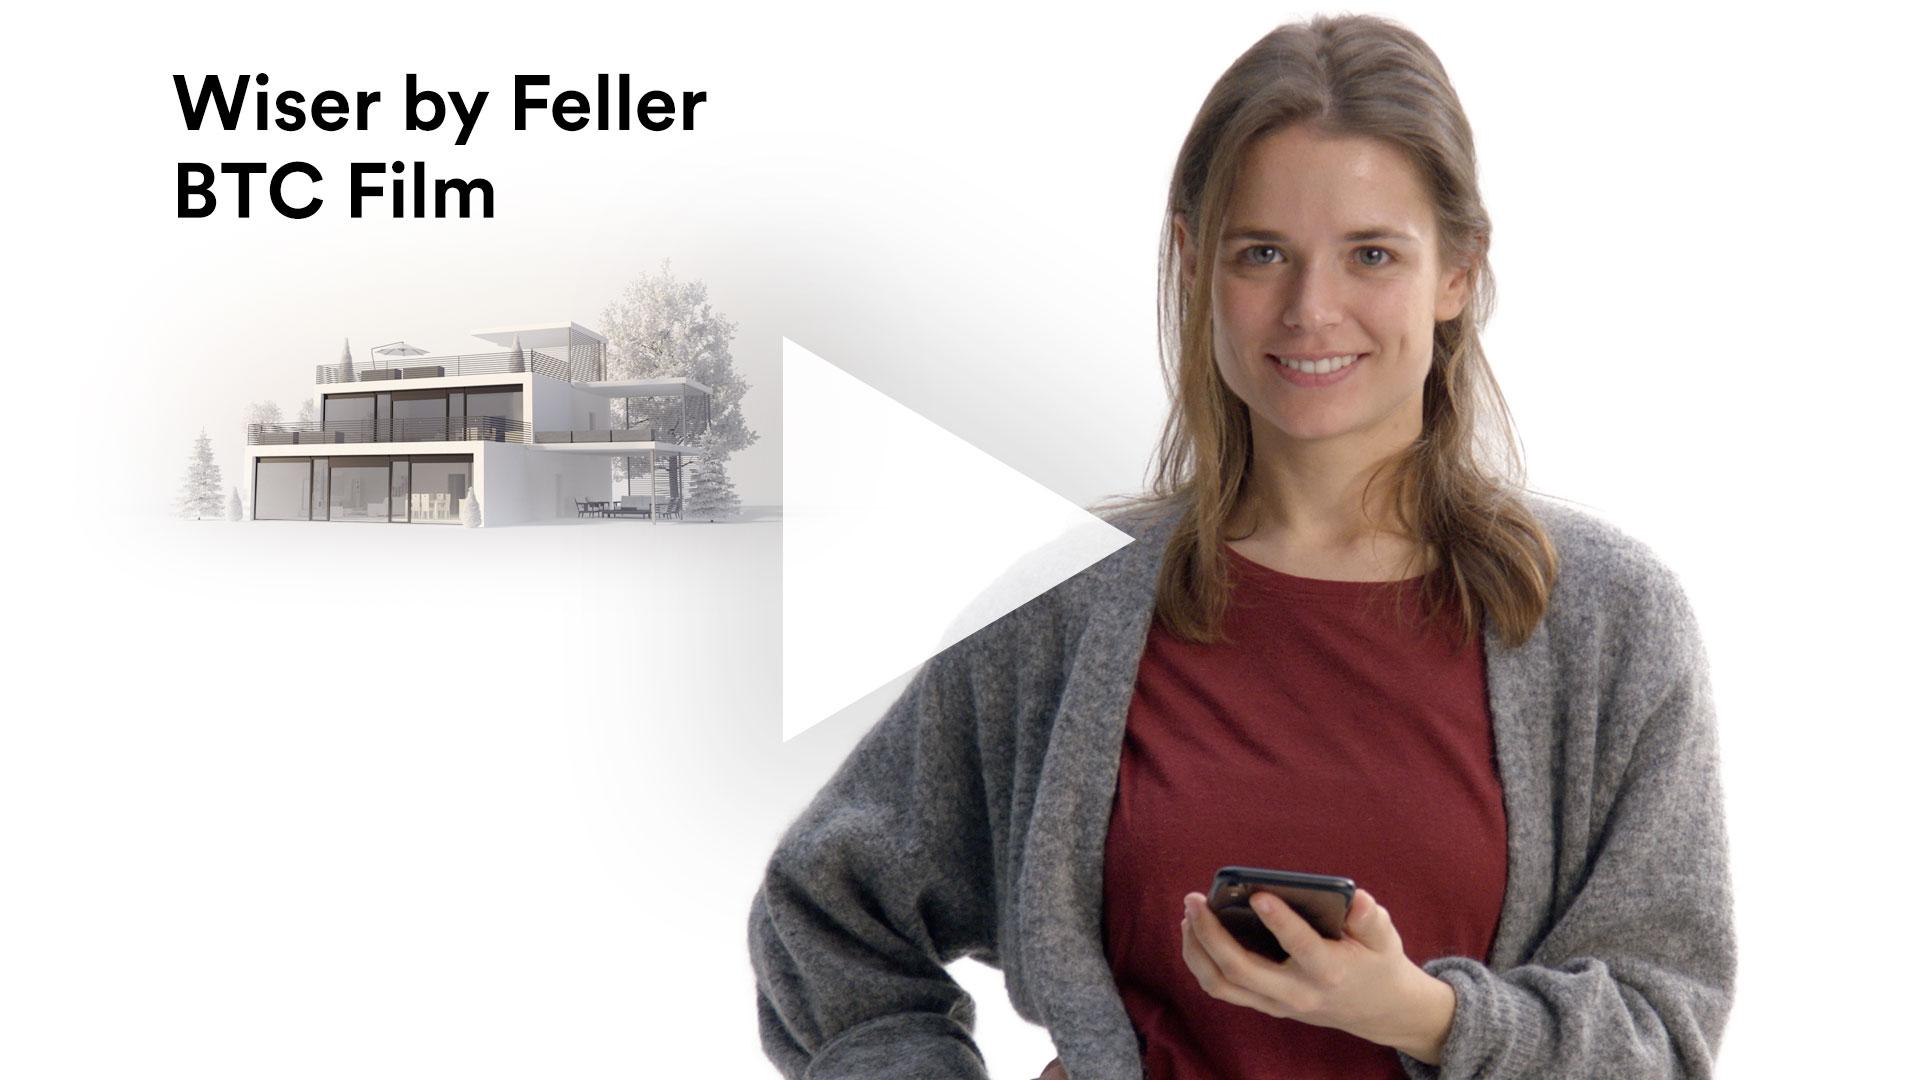 Pfeil-Thumbnail_Wiser-by-Feller-BTC